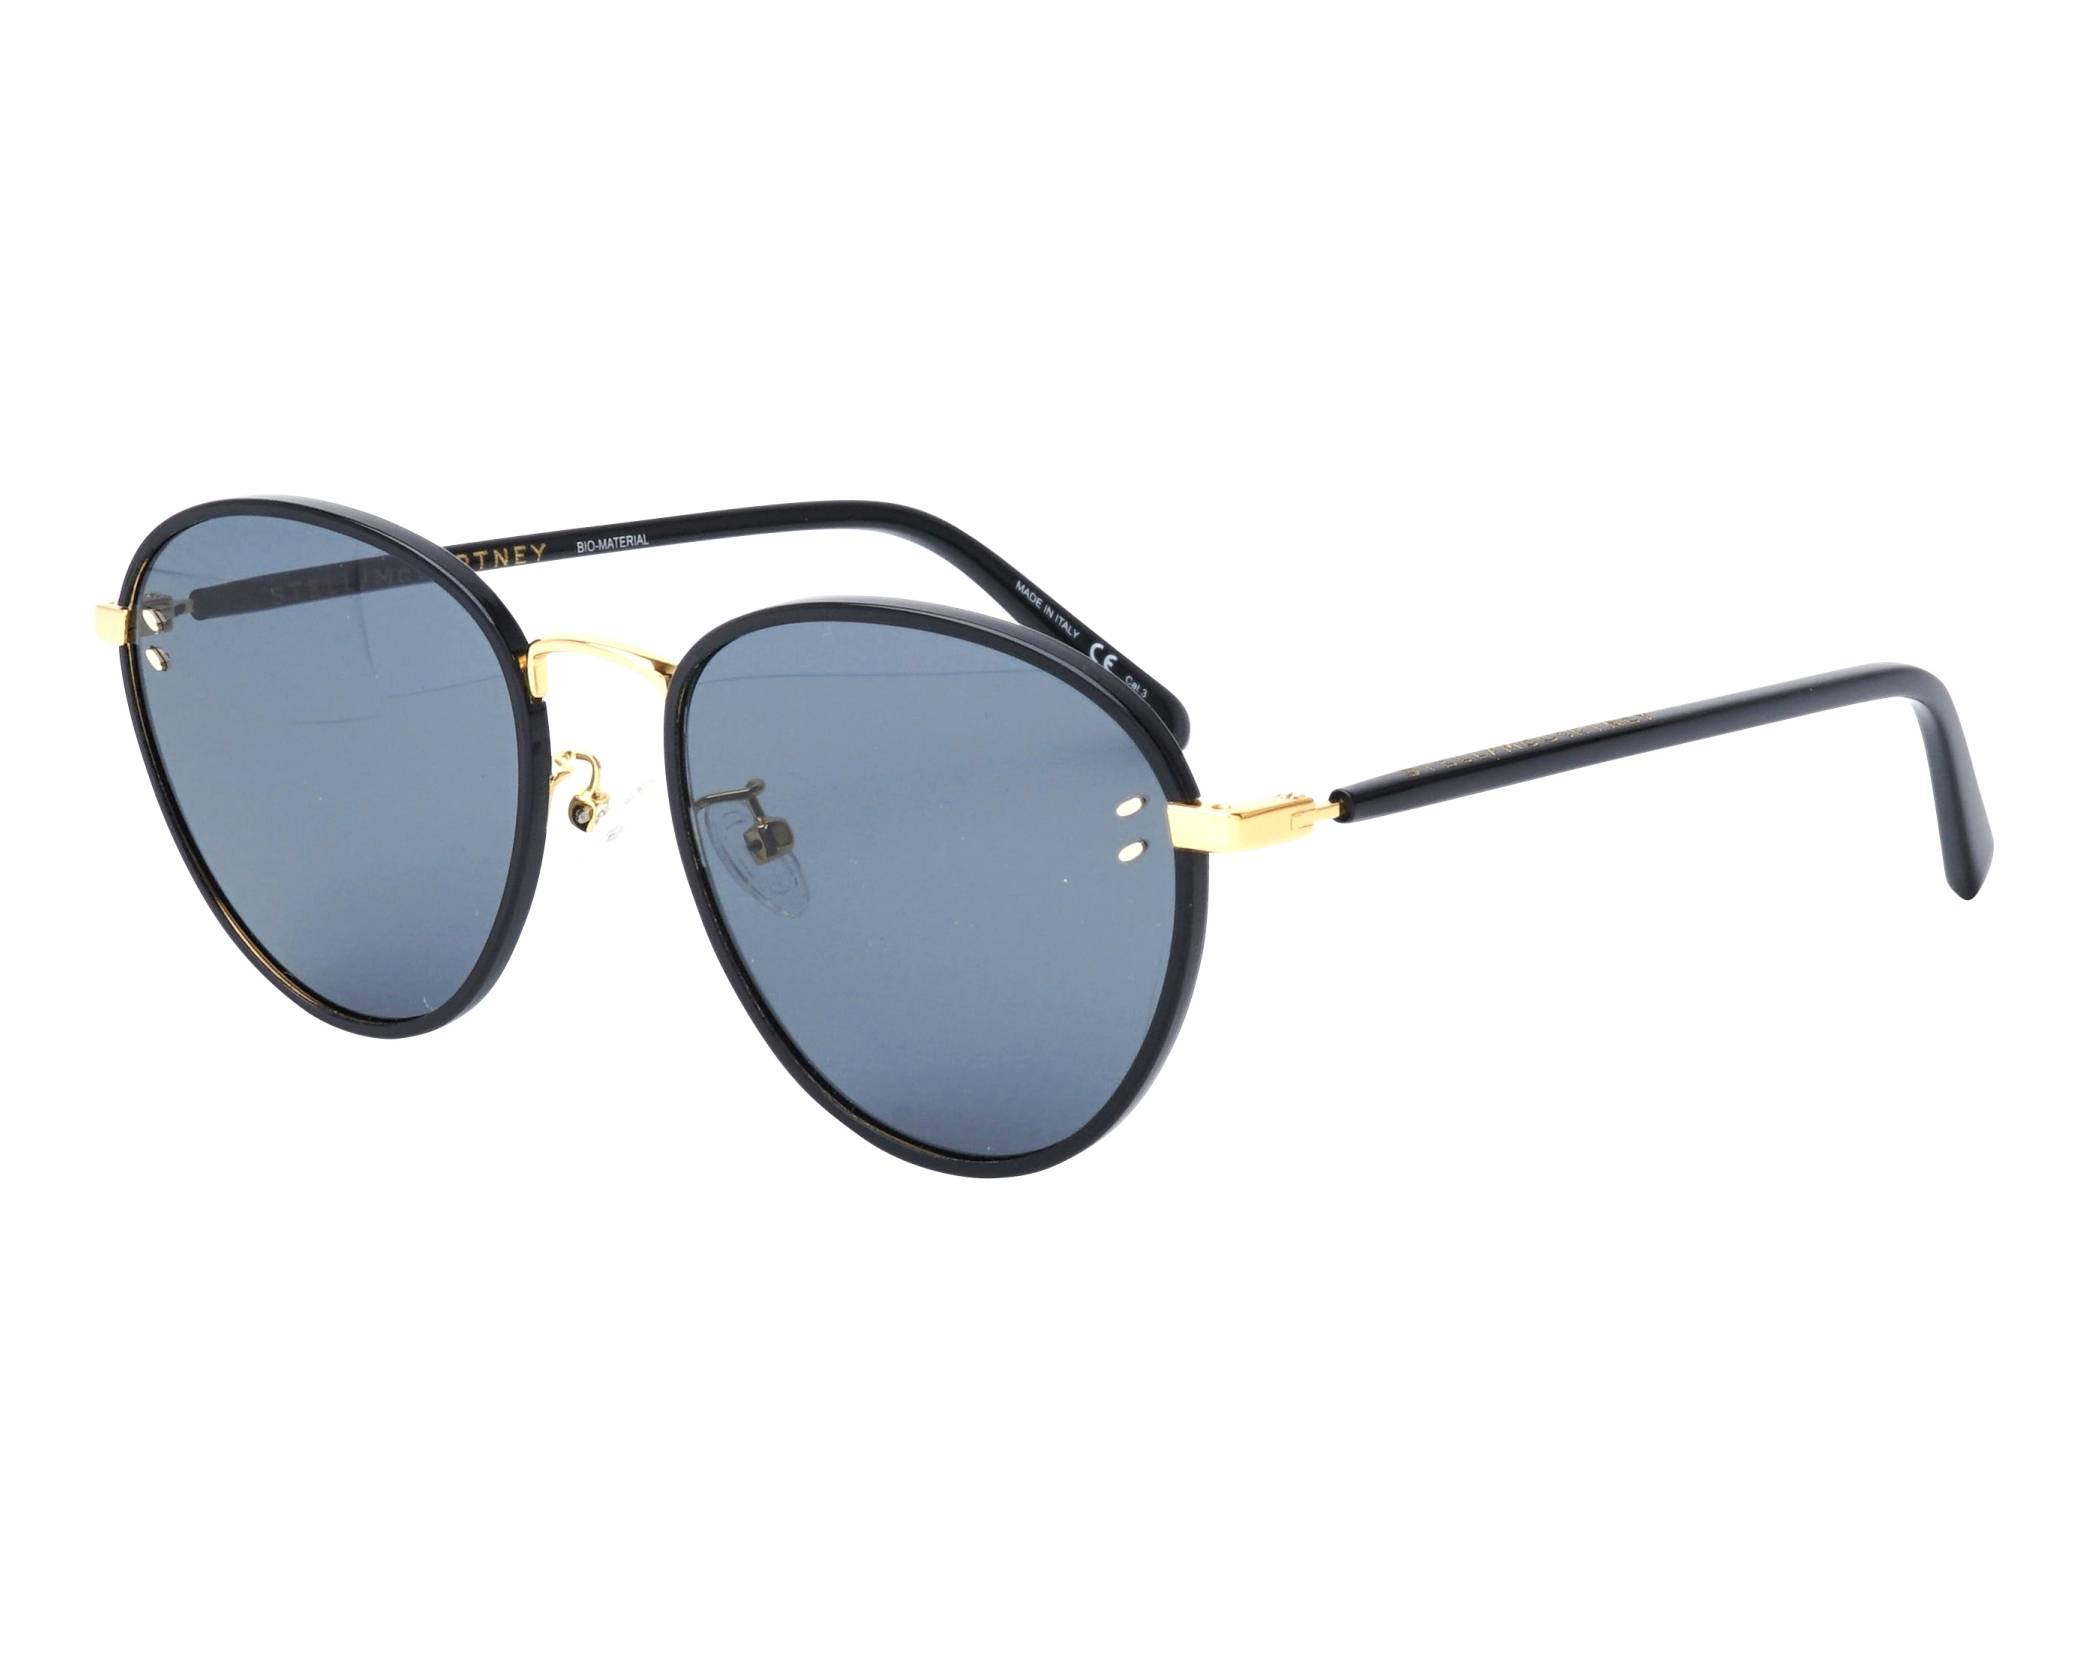 42b0b8ba4e Gafas de sol Stella McCartney SC-0147-S 001 52-17 Negra Oro